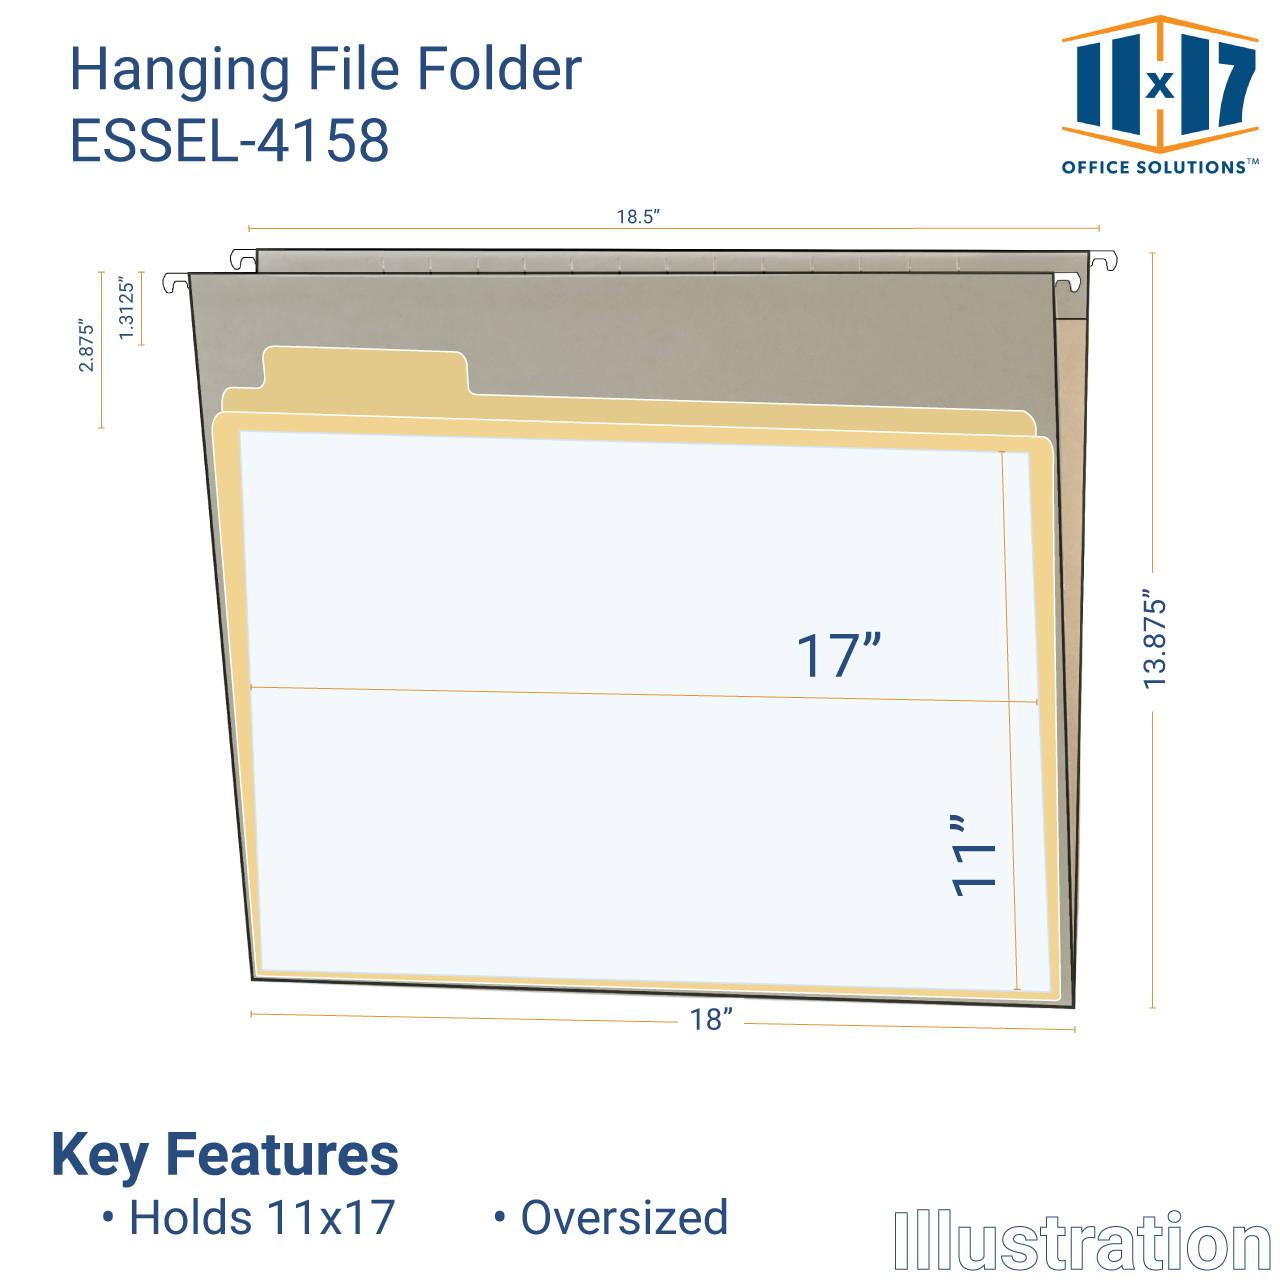 illustration of hanging file folder and 11x17 sheet